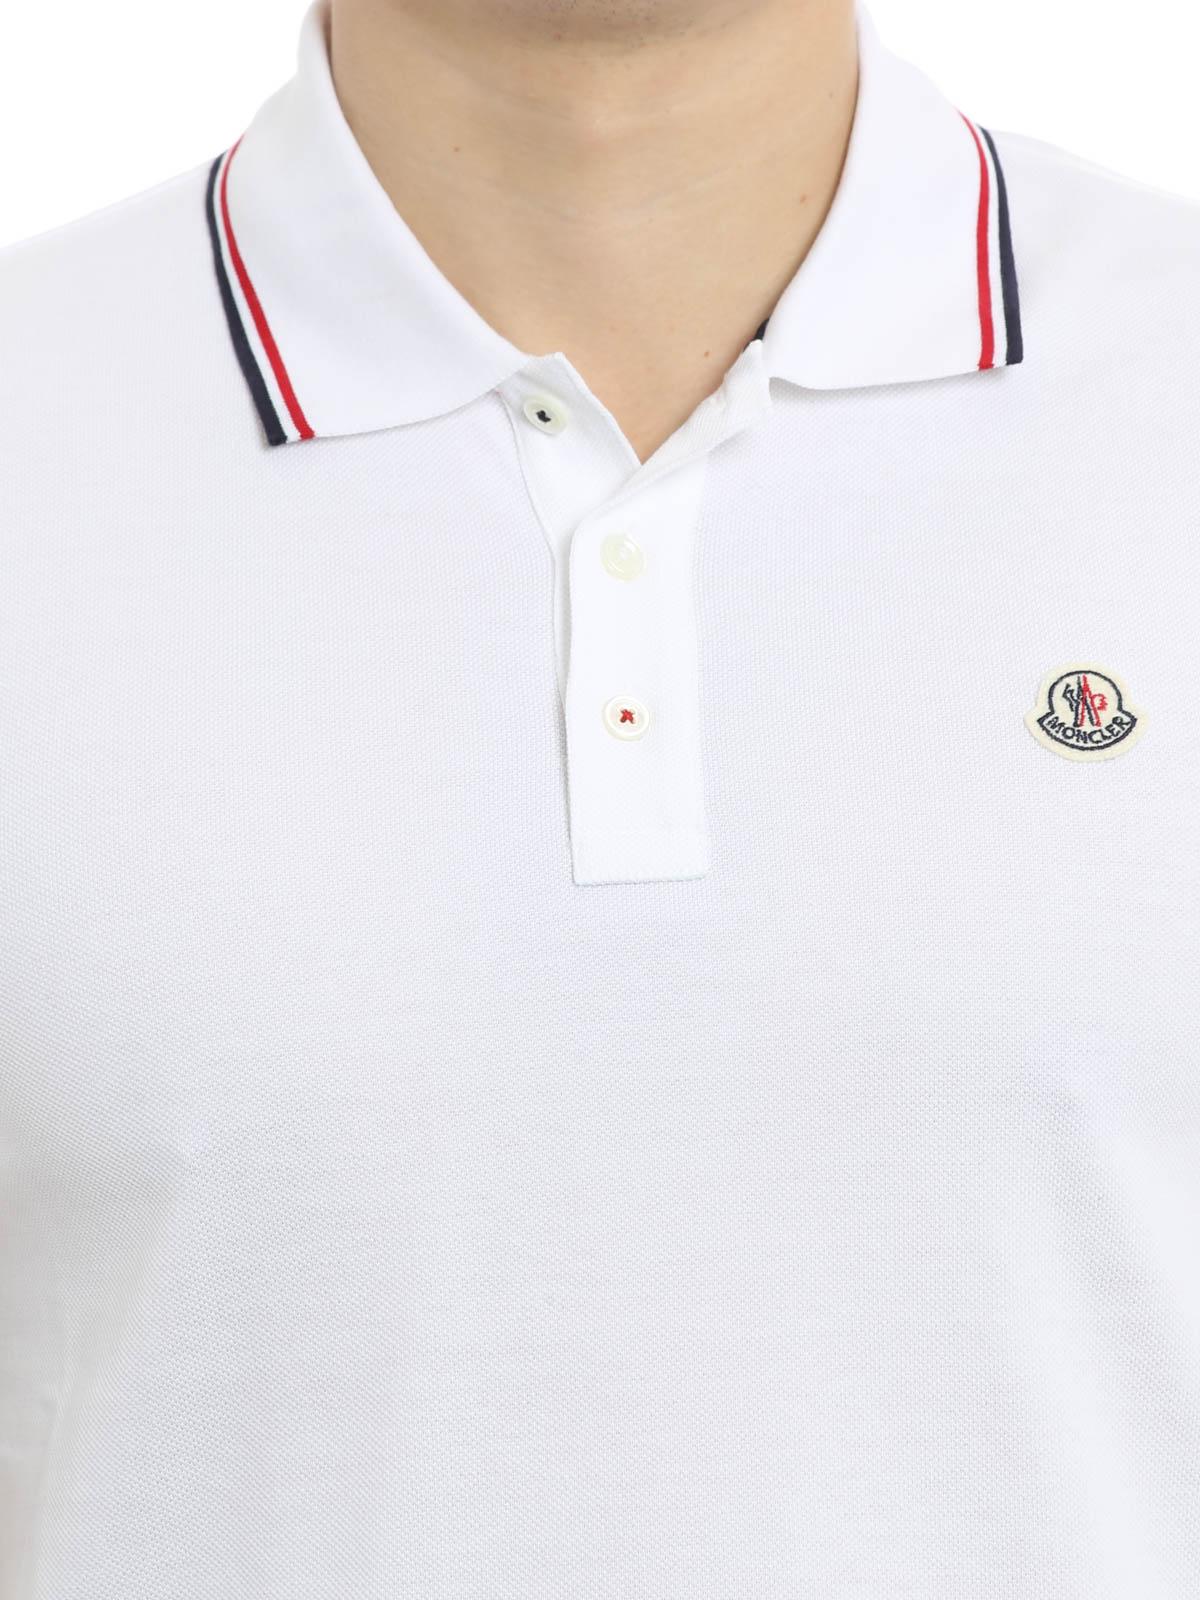 lowest price eddaf bd41c Moncler - Contrasting trim polo shirt - polo shirts - C1 091 ...